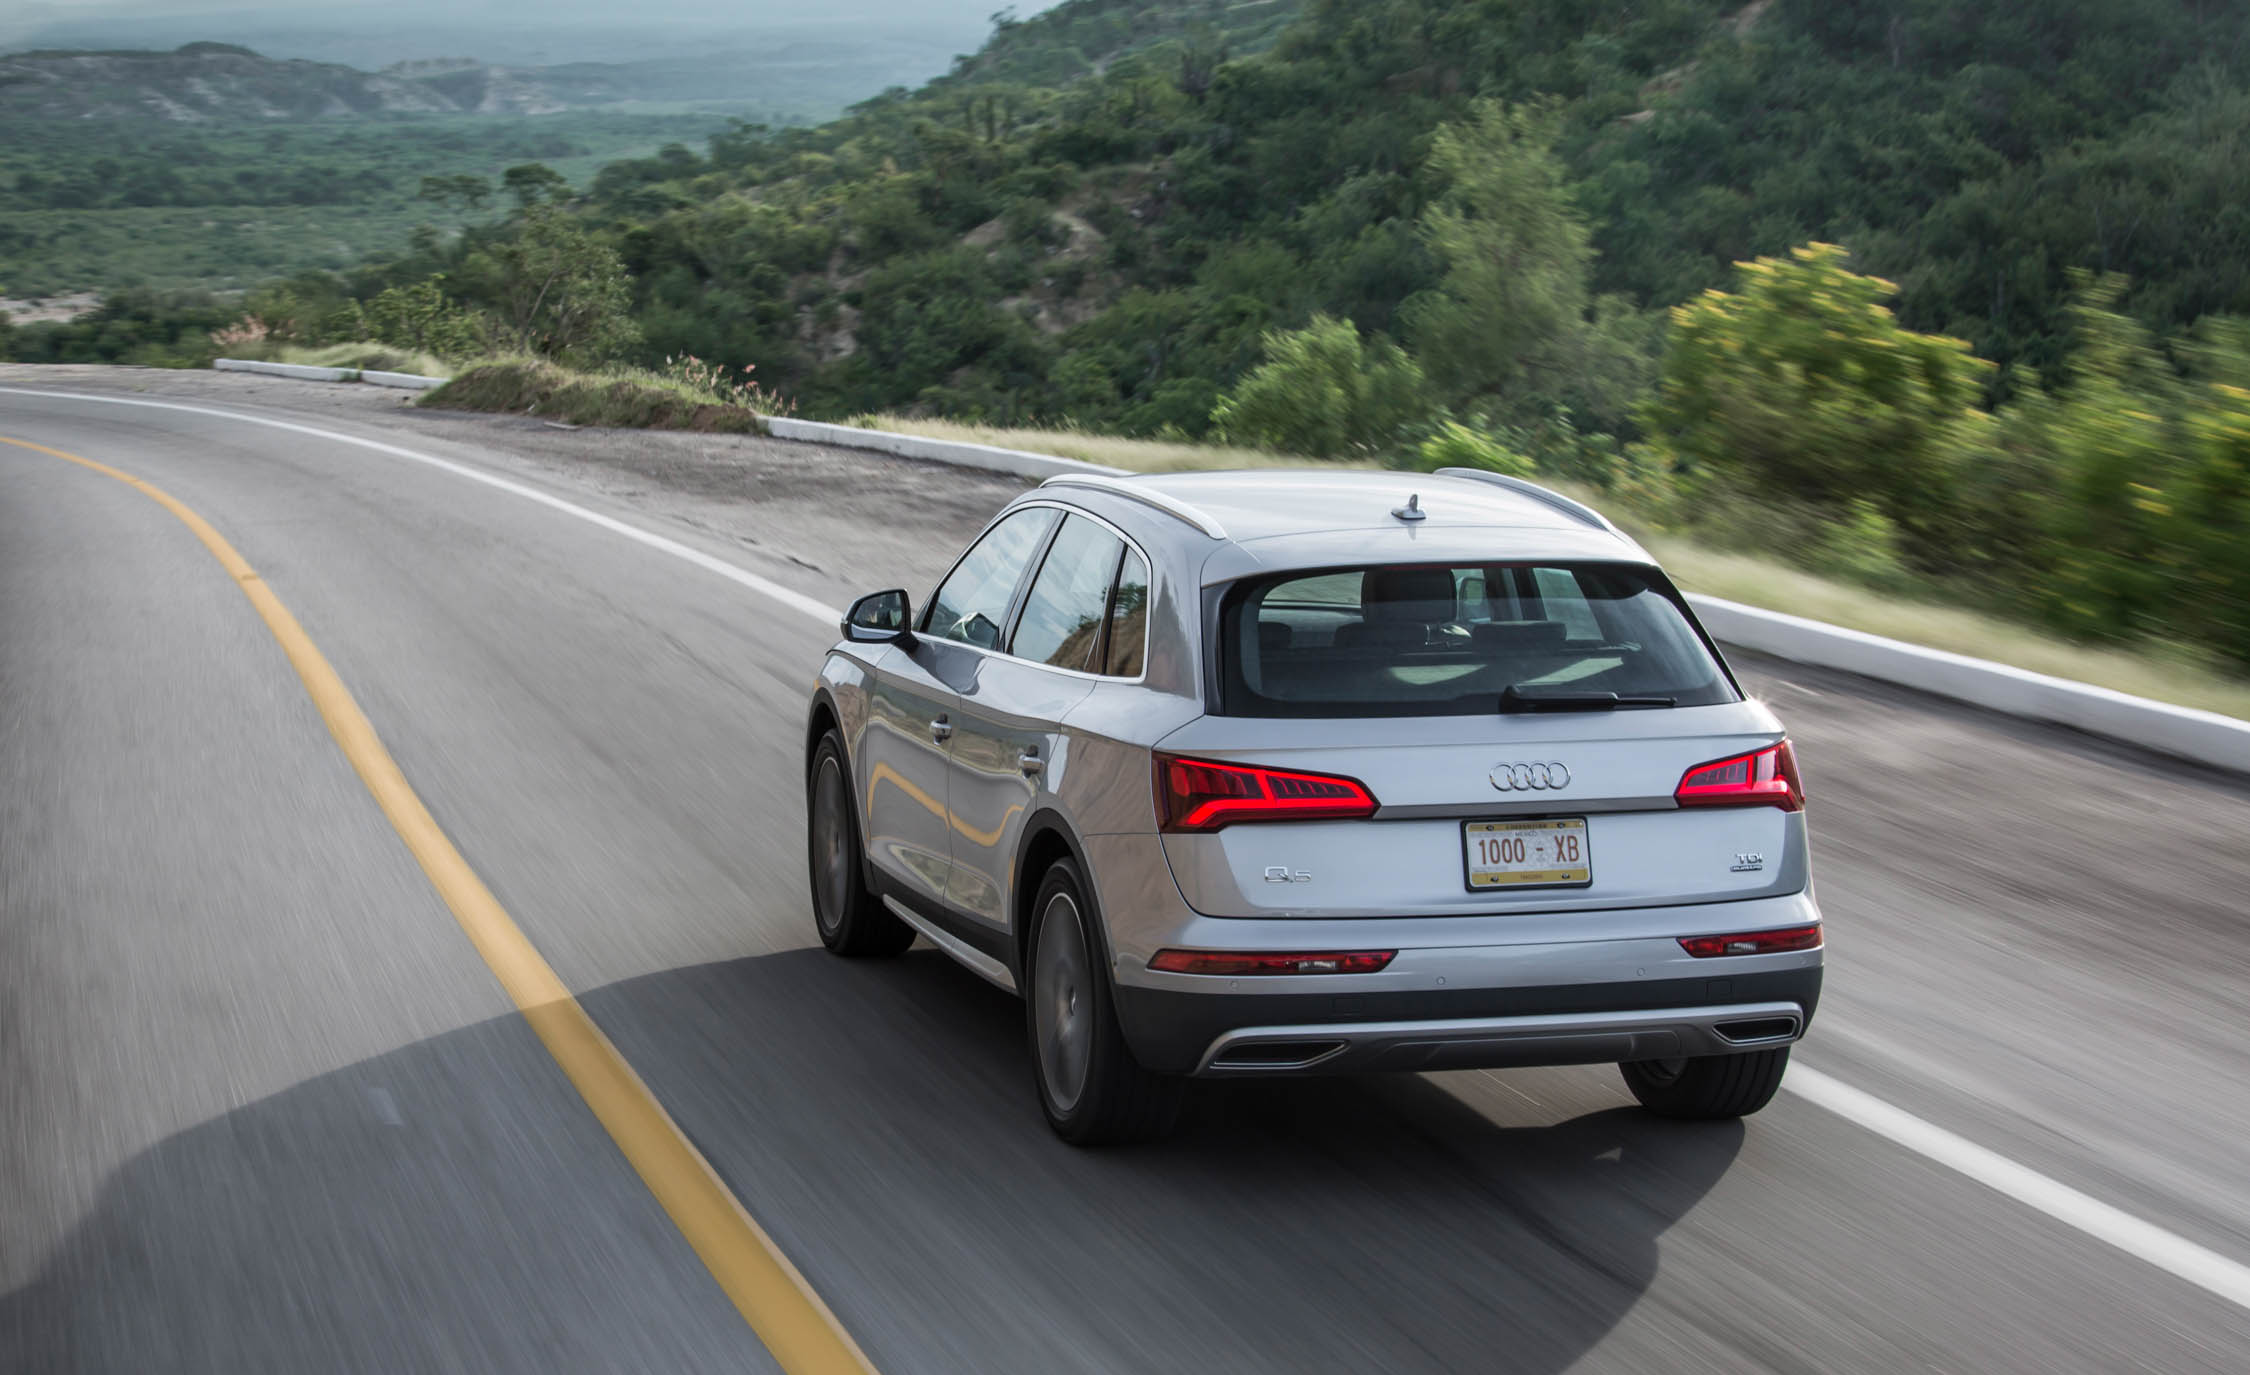 2018 Audi Q (View 13 of 40)